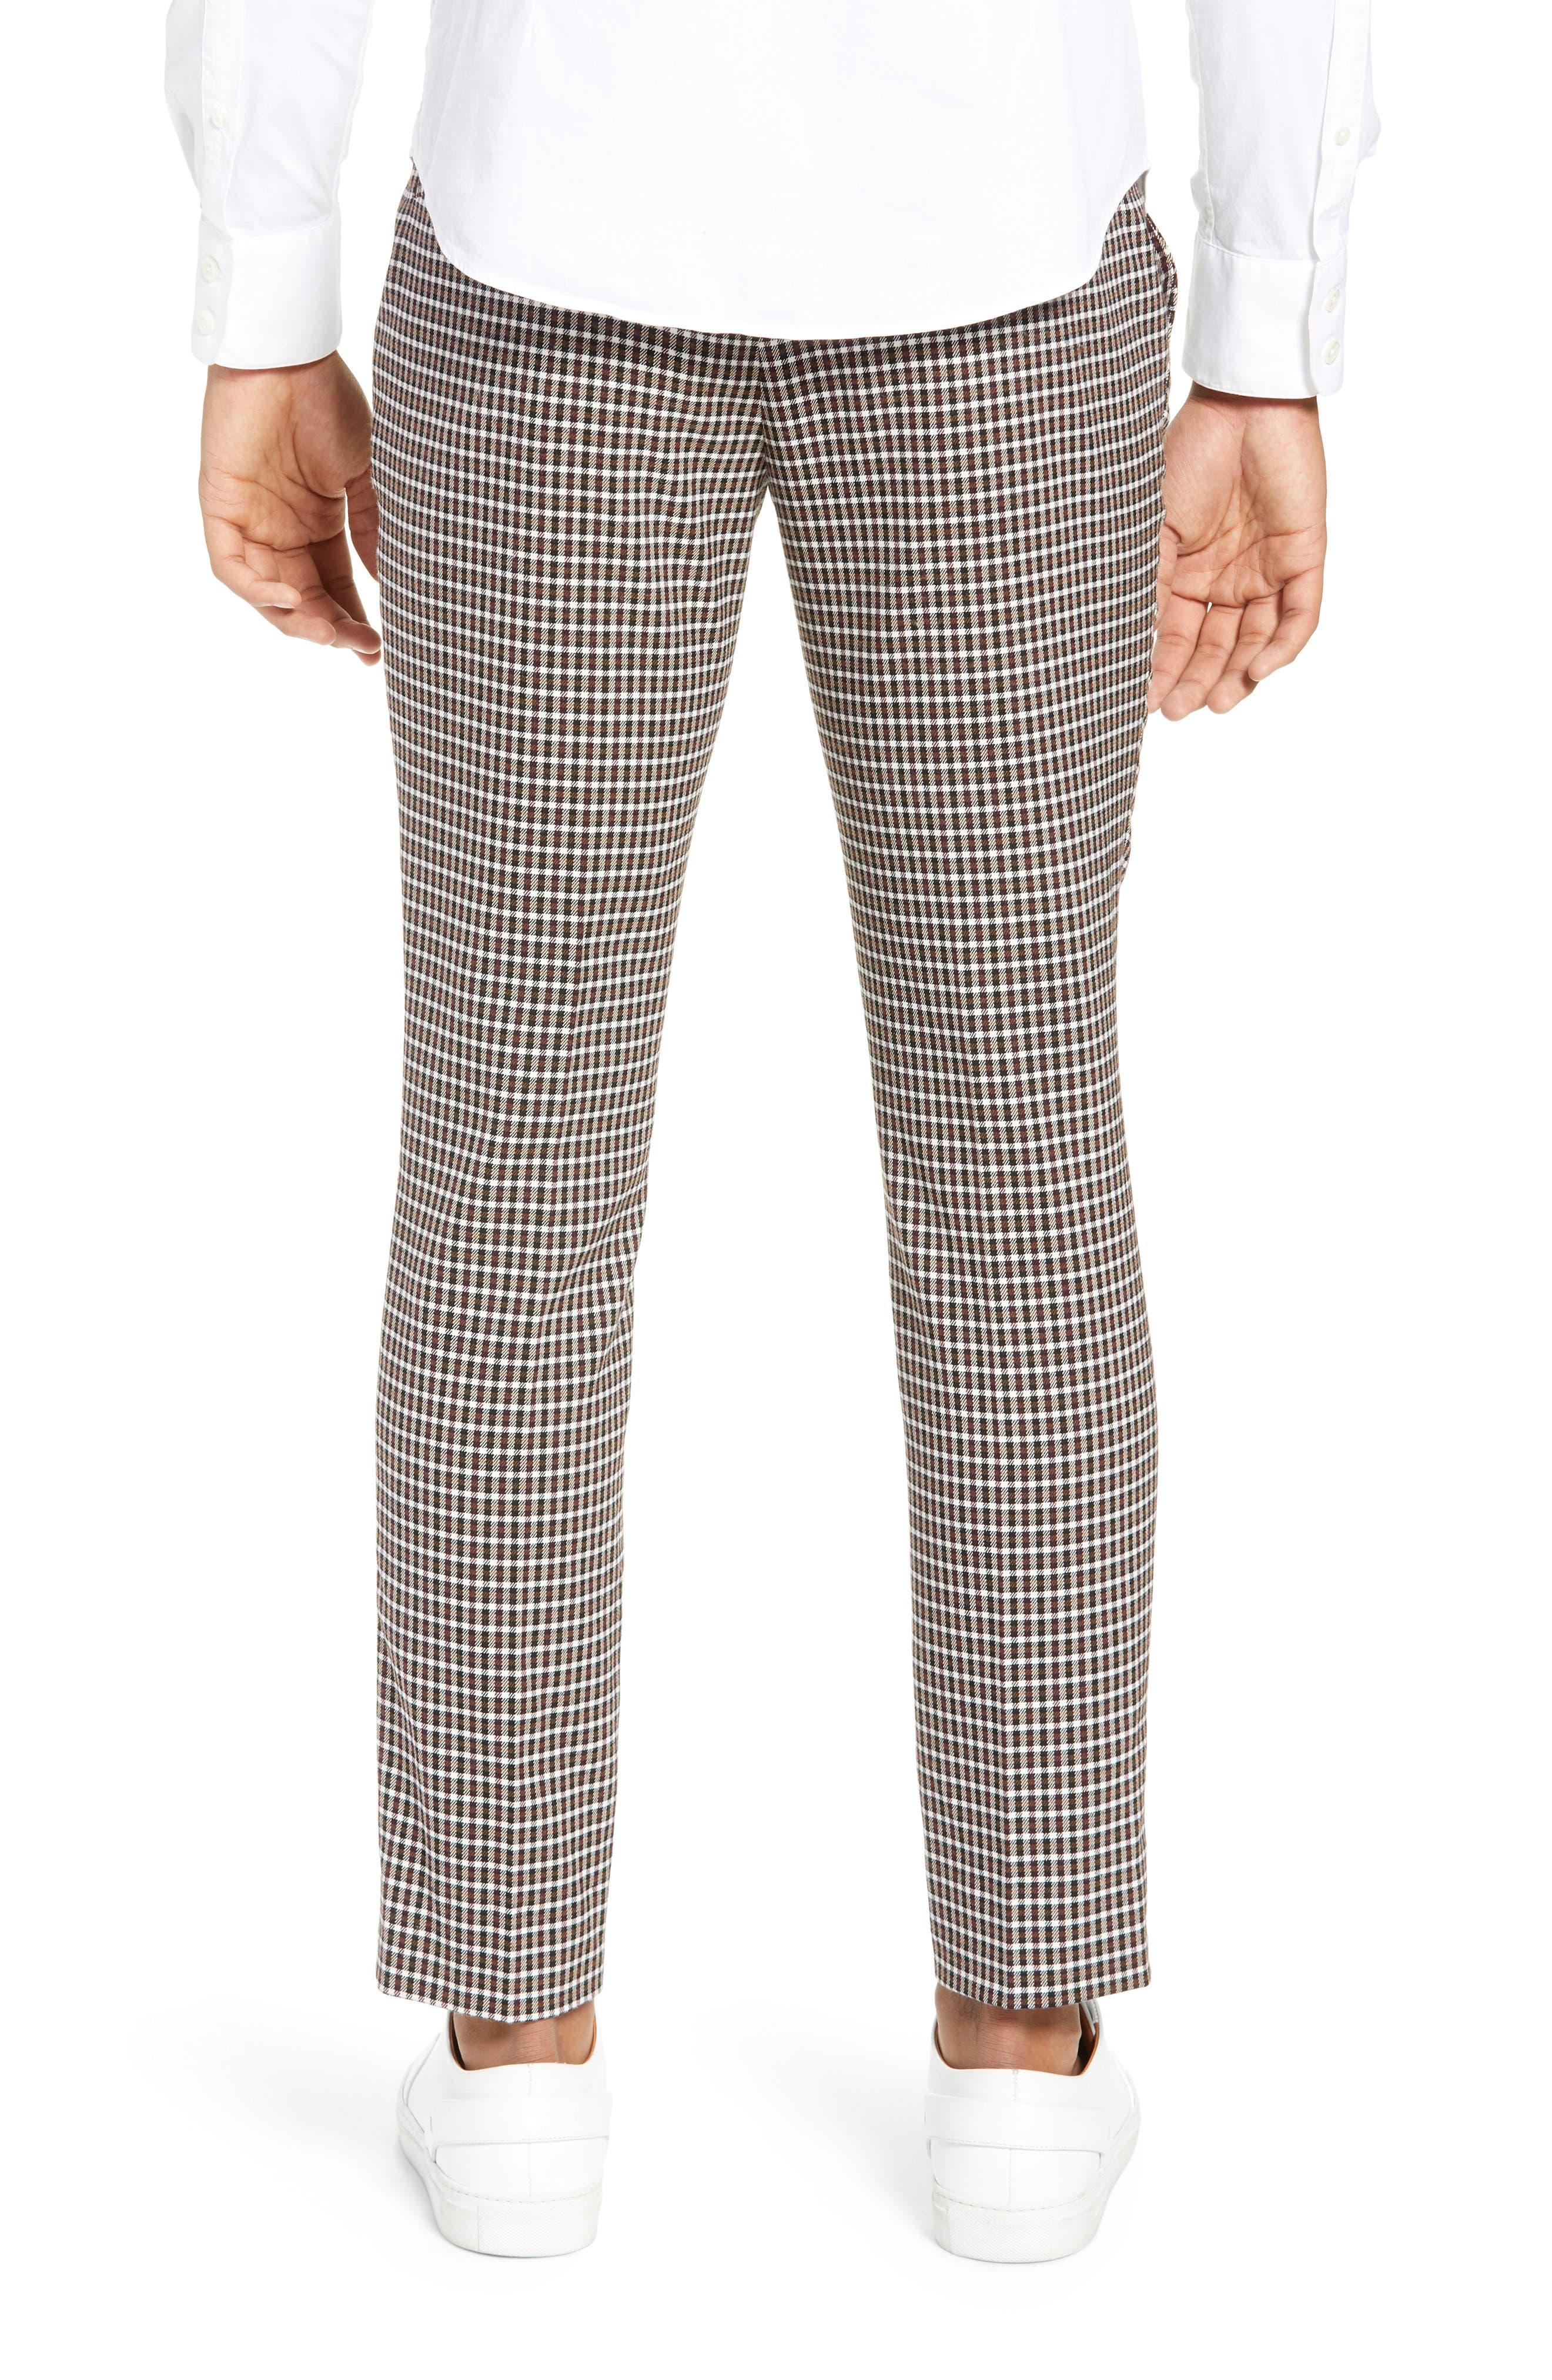 TOPMAN, Multicheck Skinny Fit Trousers, Alternate thumbnail 2, color, BLACK MULTI